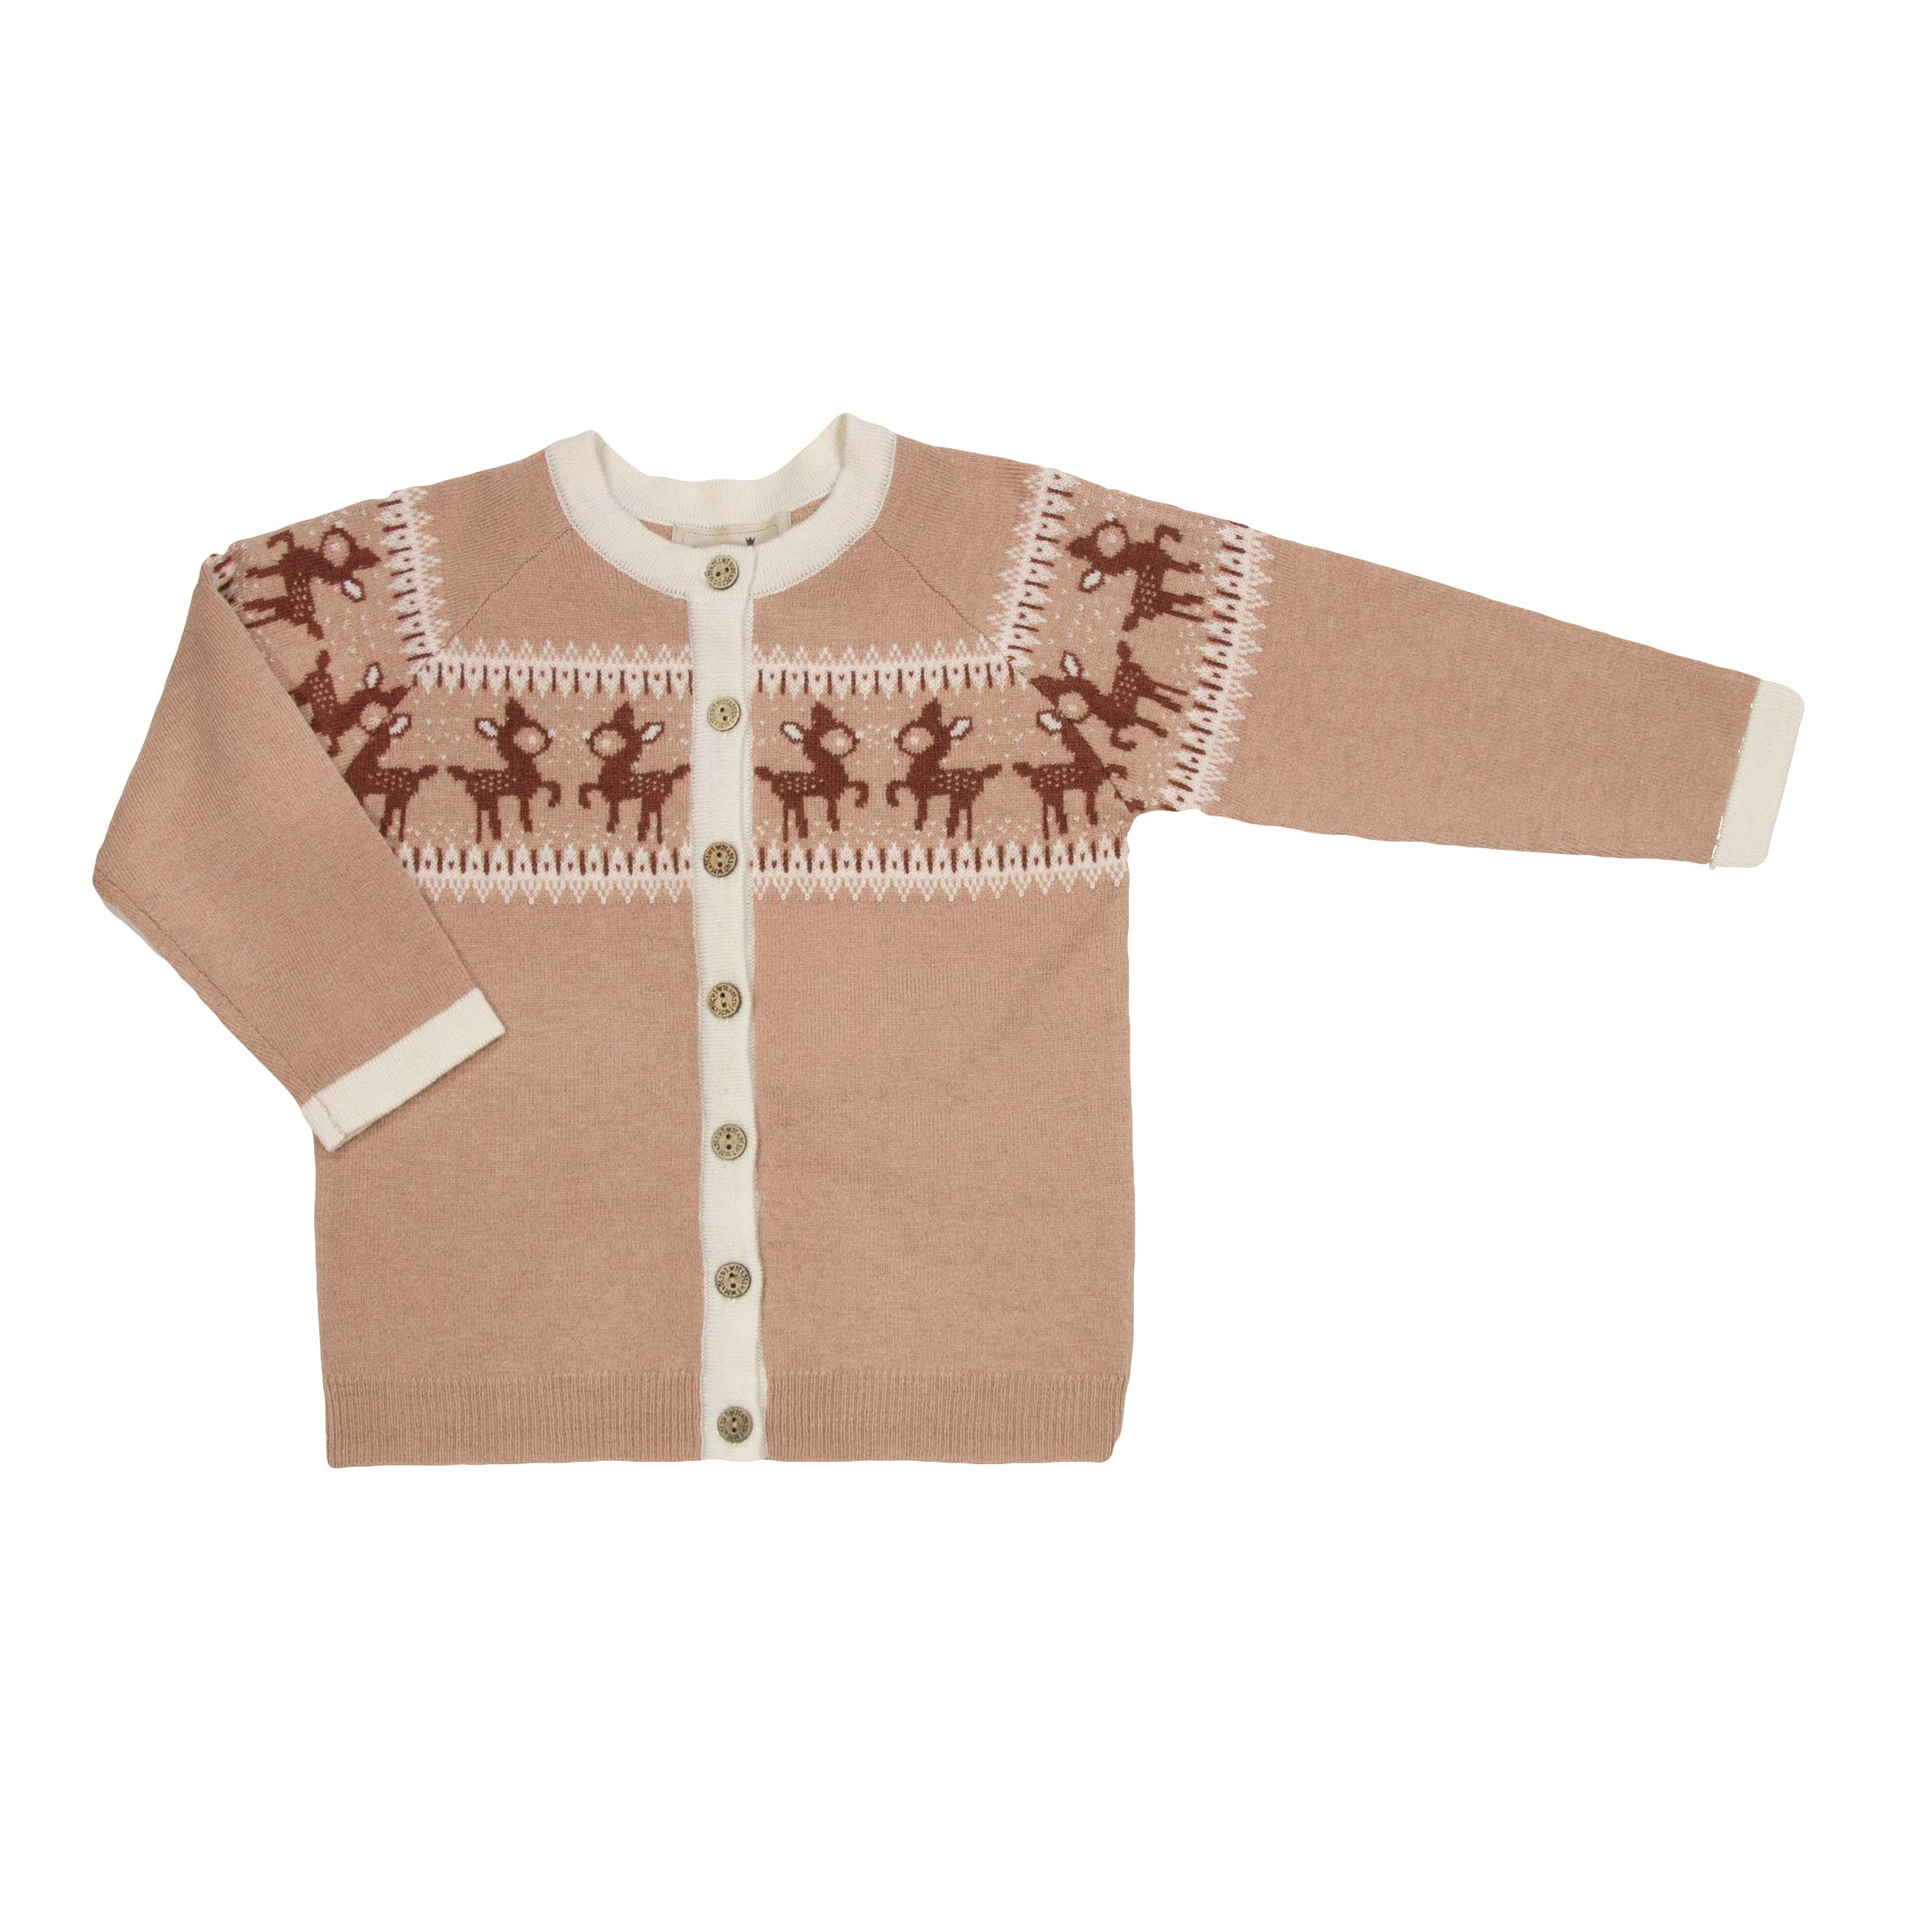 fce25d43 MeMini rosa strikkejakke – MeMini MeMini Bambi rosa cardigan – Mio Trend